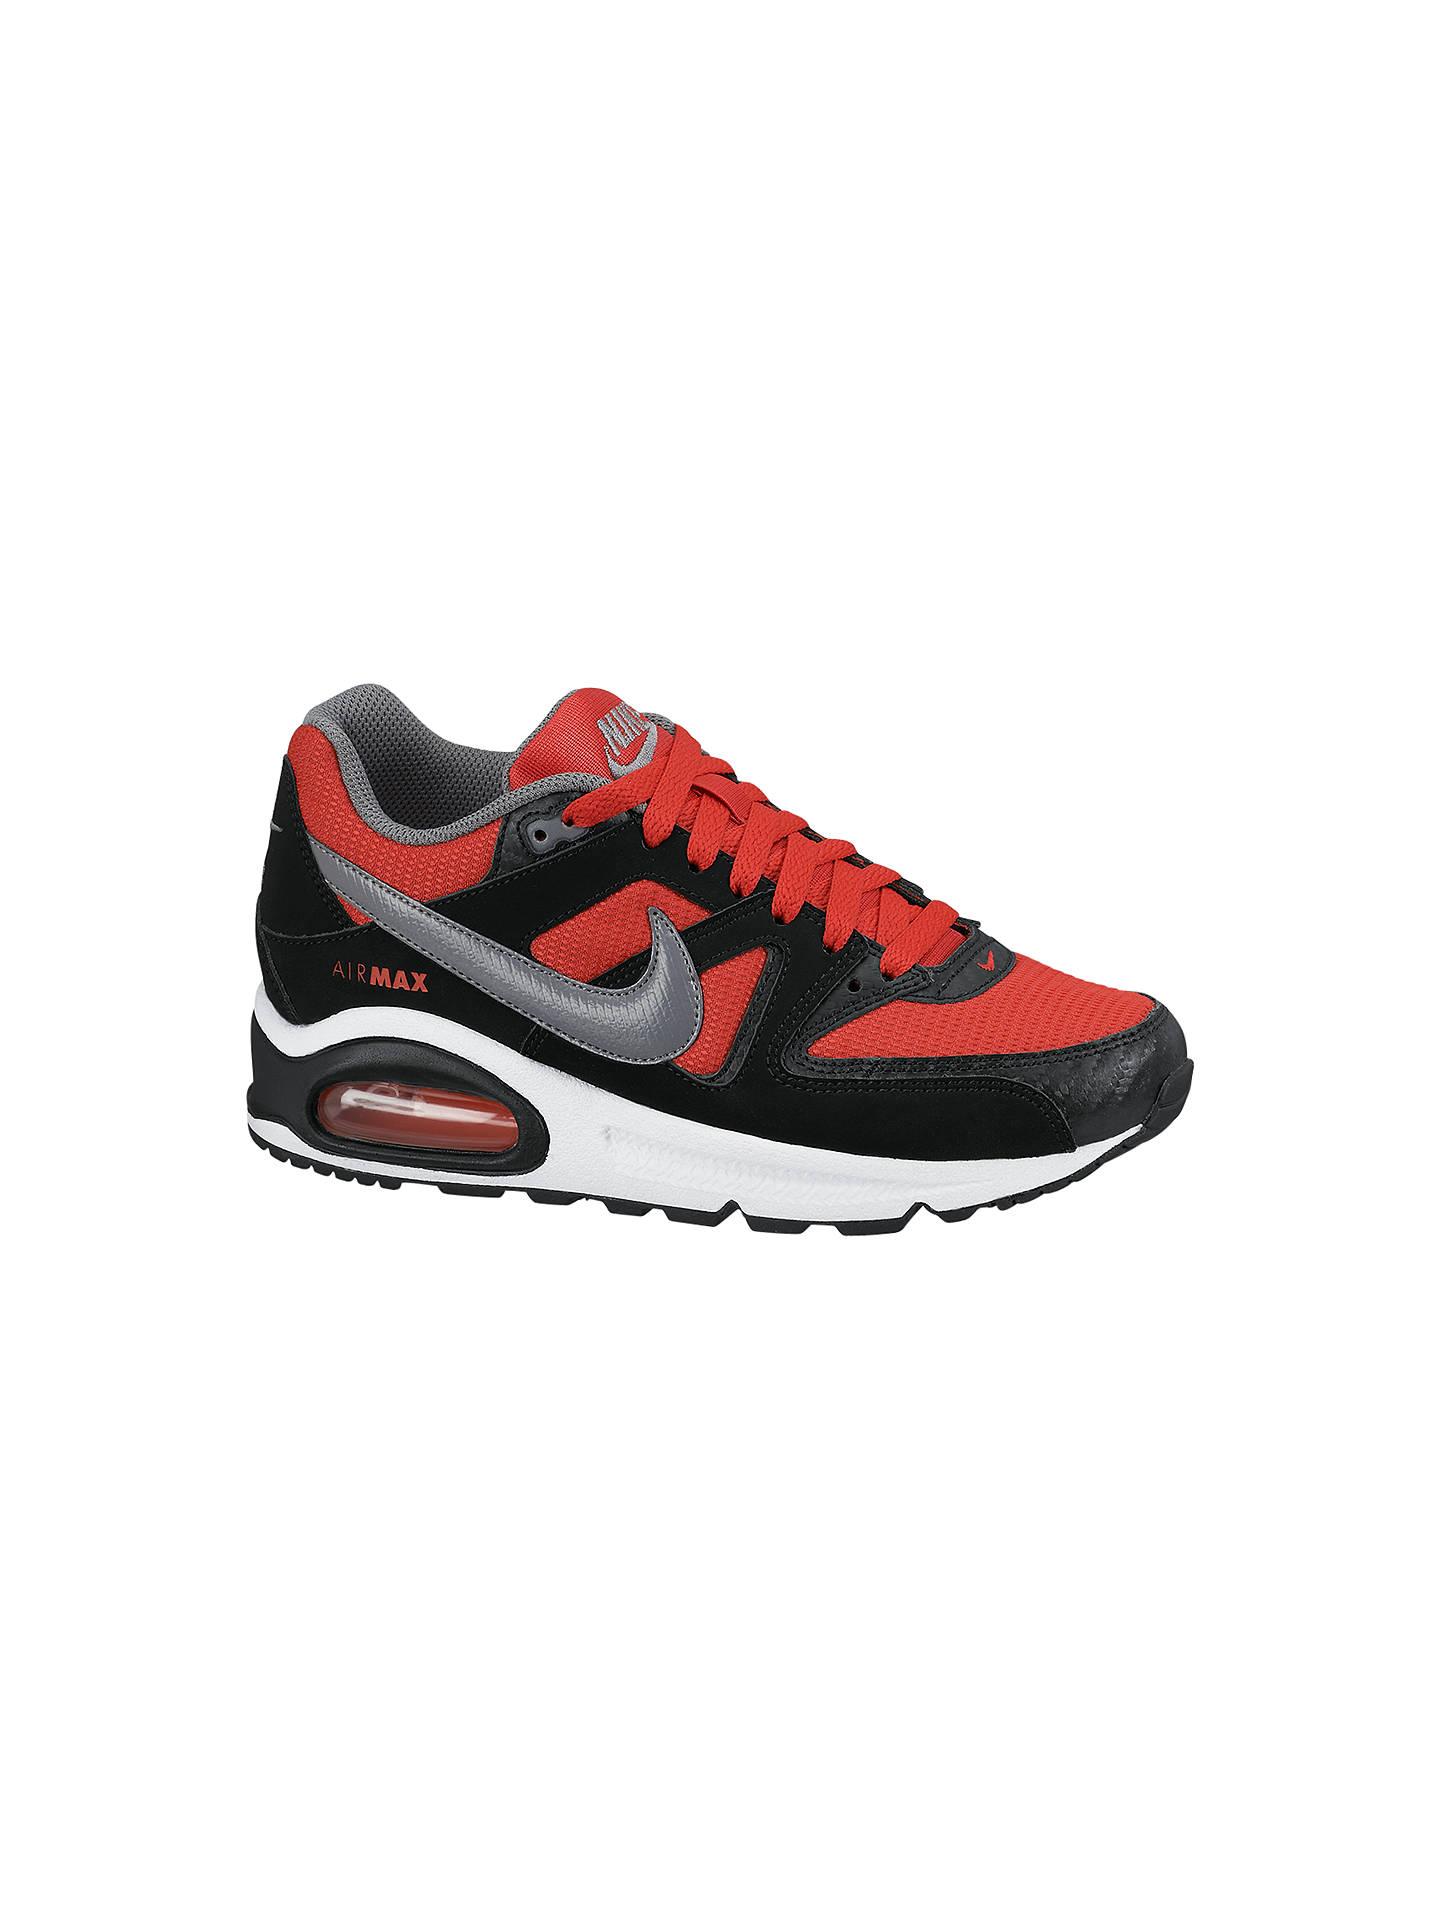 Nike Childrens' Air Max Command Trainers, RedBlack at John